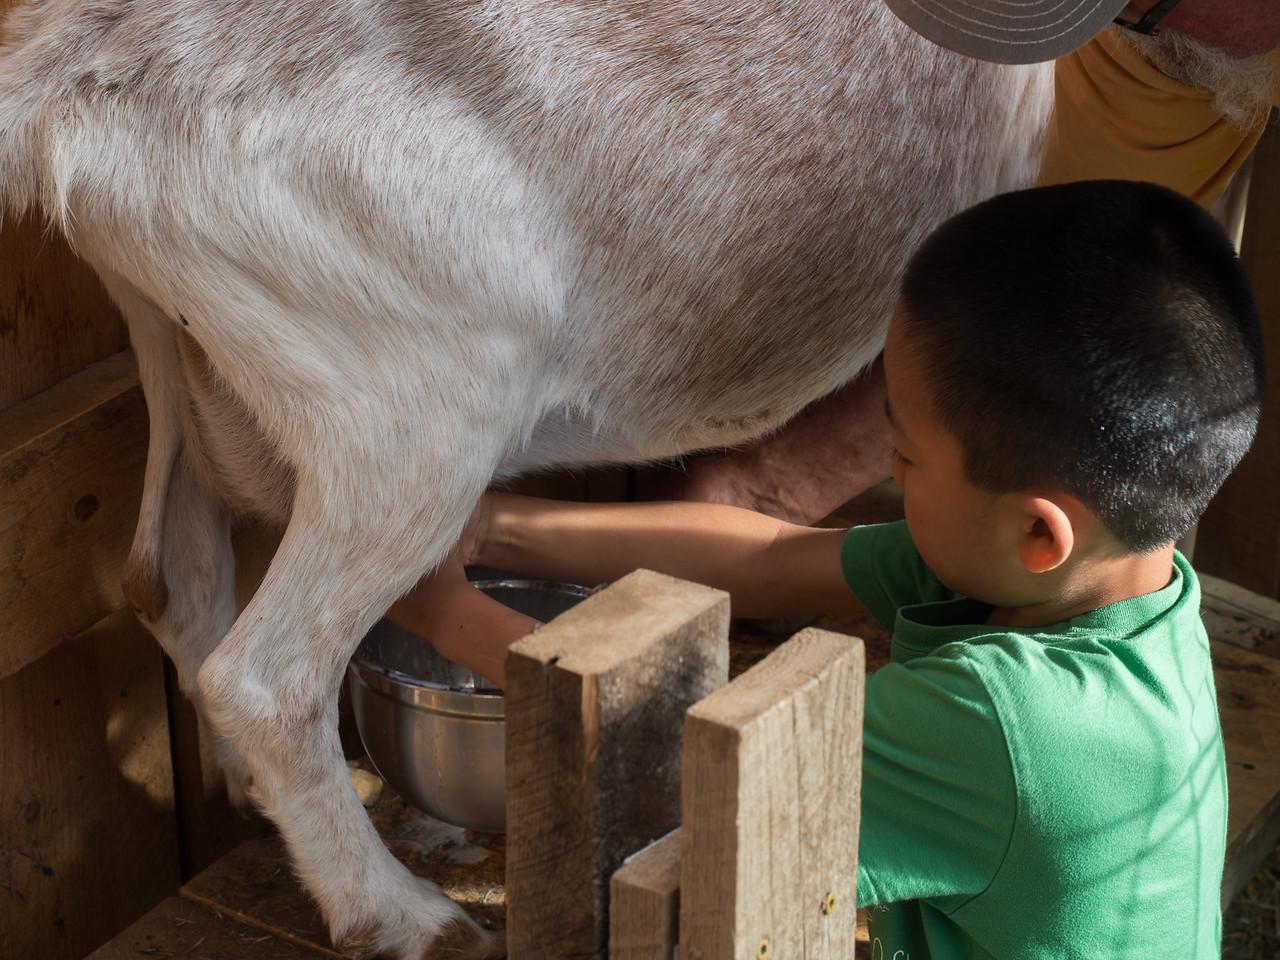 Nolan milking a goat.